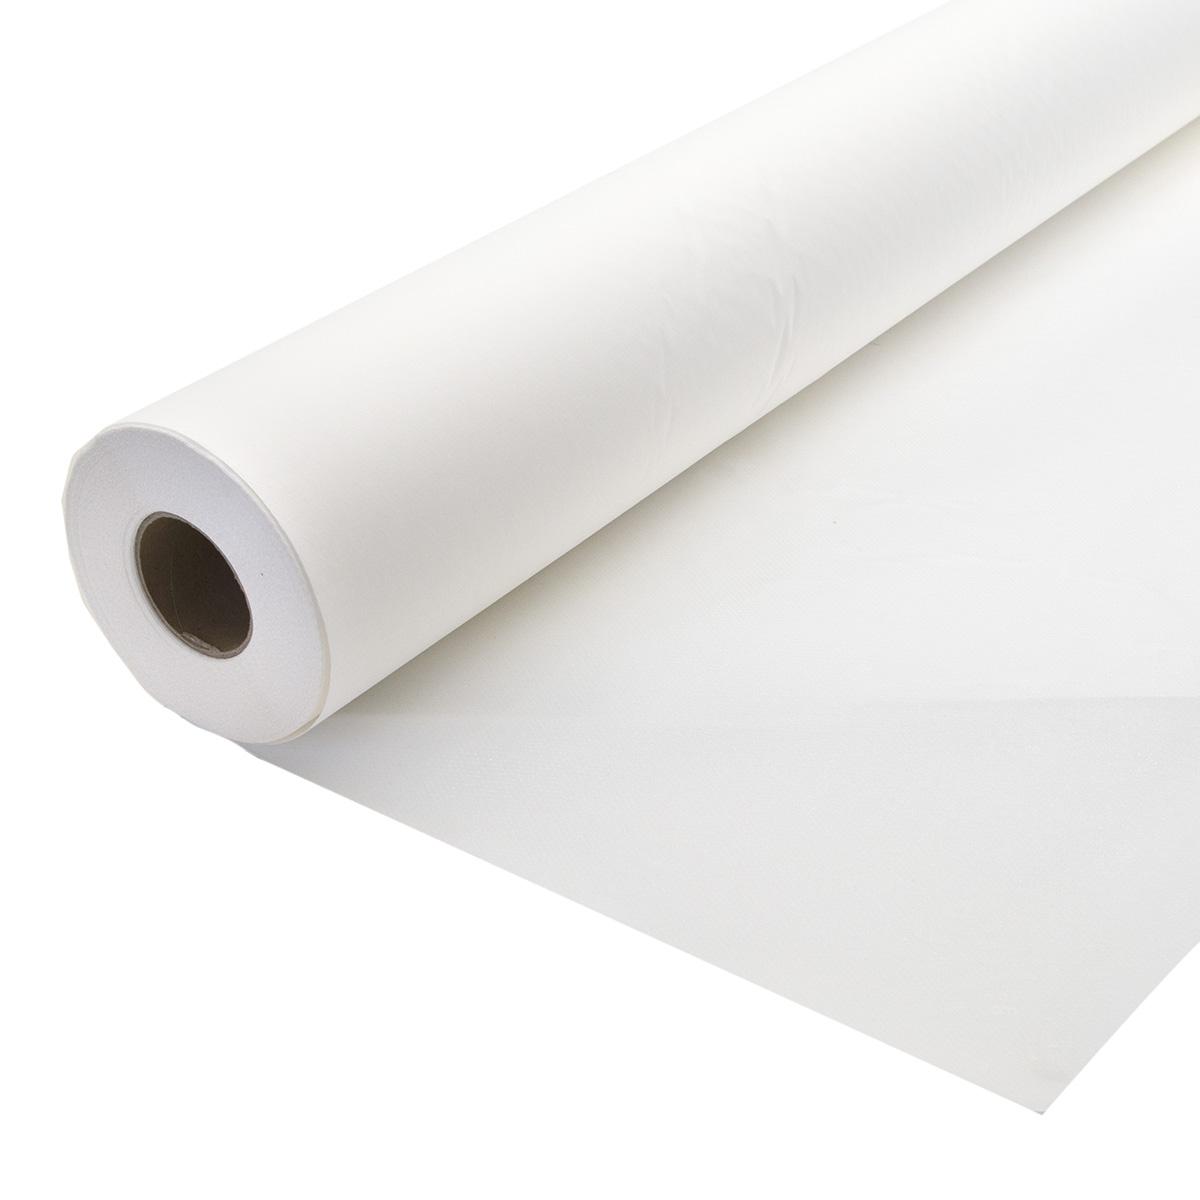 Паутинка на бумаге 100см*50м 0531-1001, белая